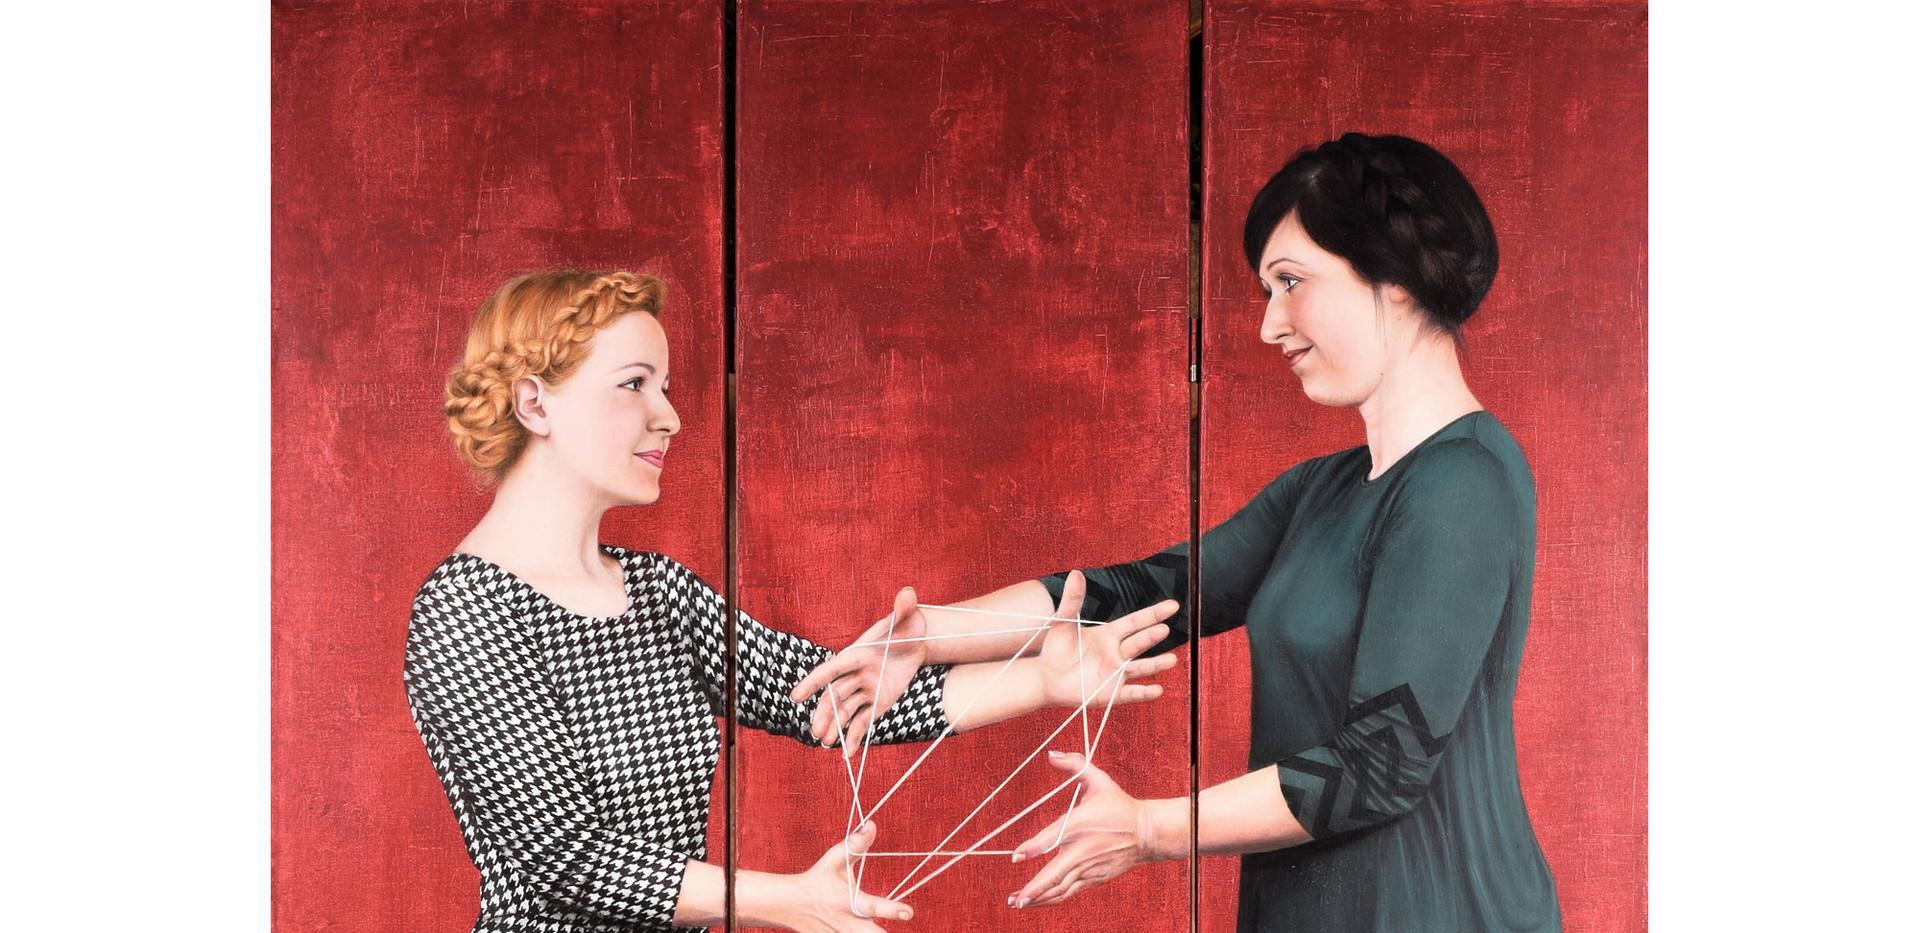 Sandra De Jaume, Spinning Friendship, acrylic on canvas, 170 x 120 cm, 2016